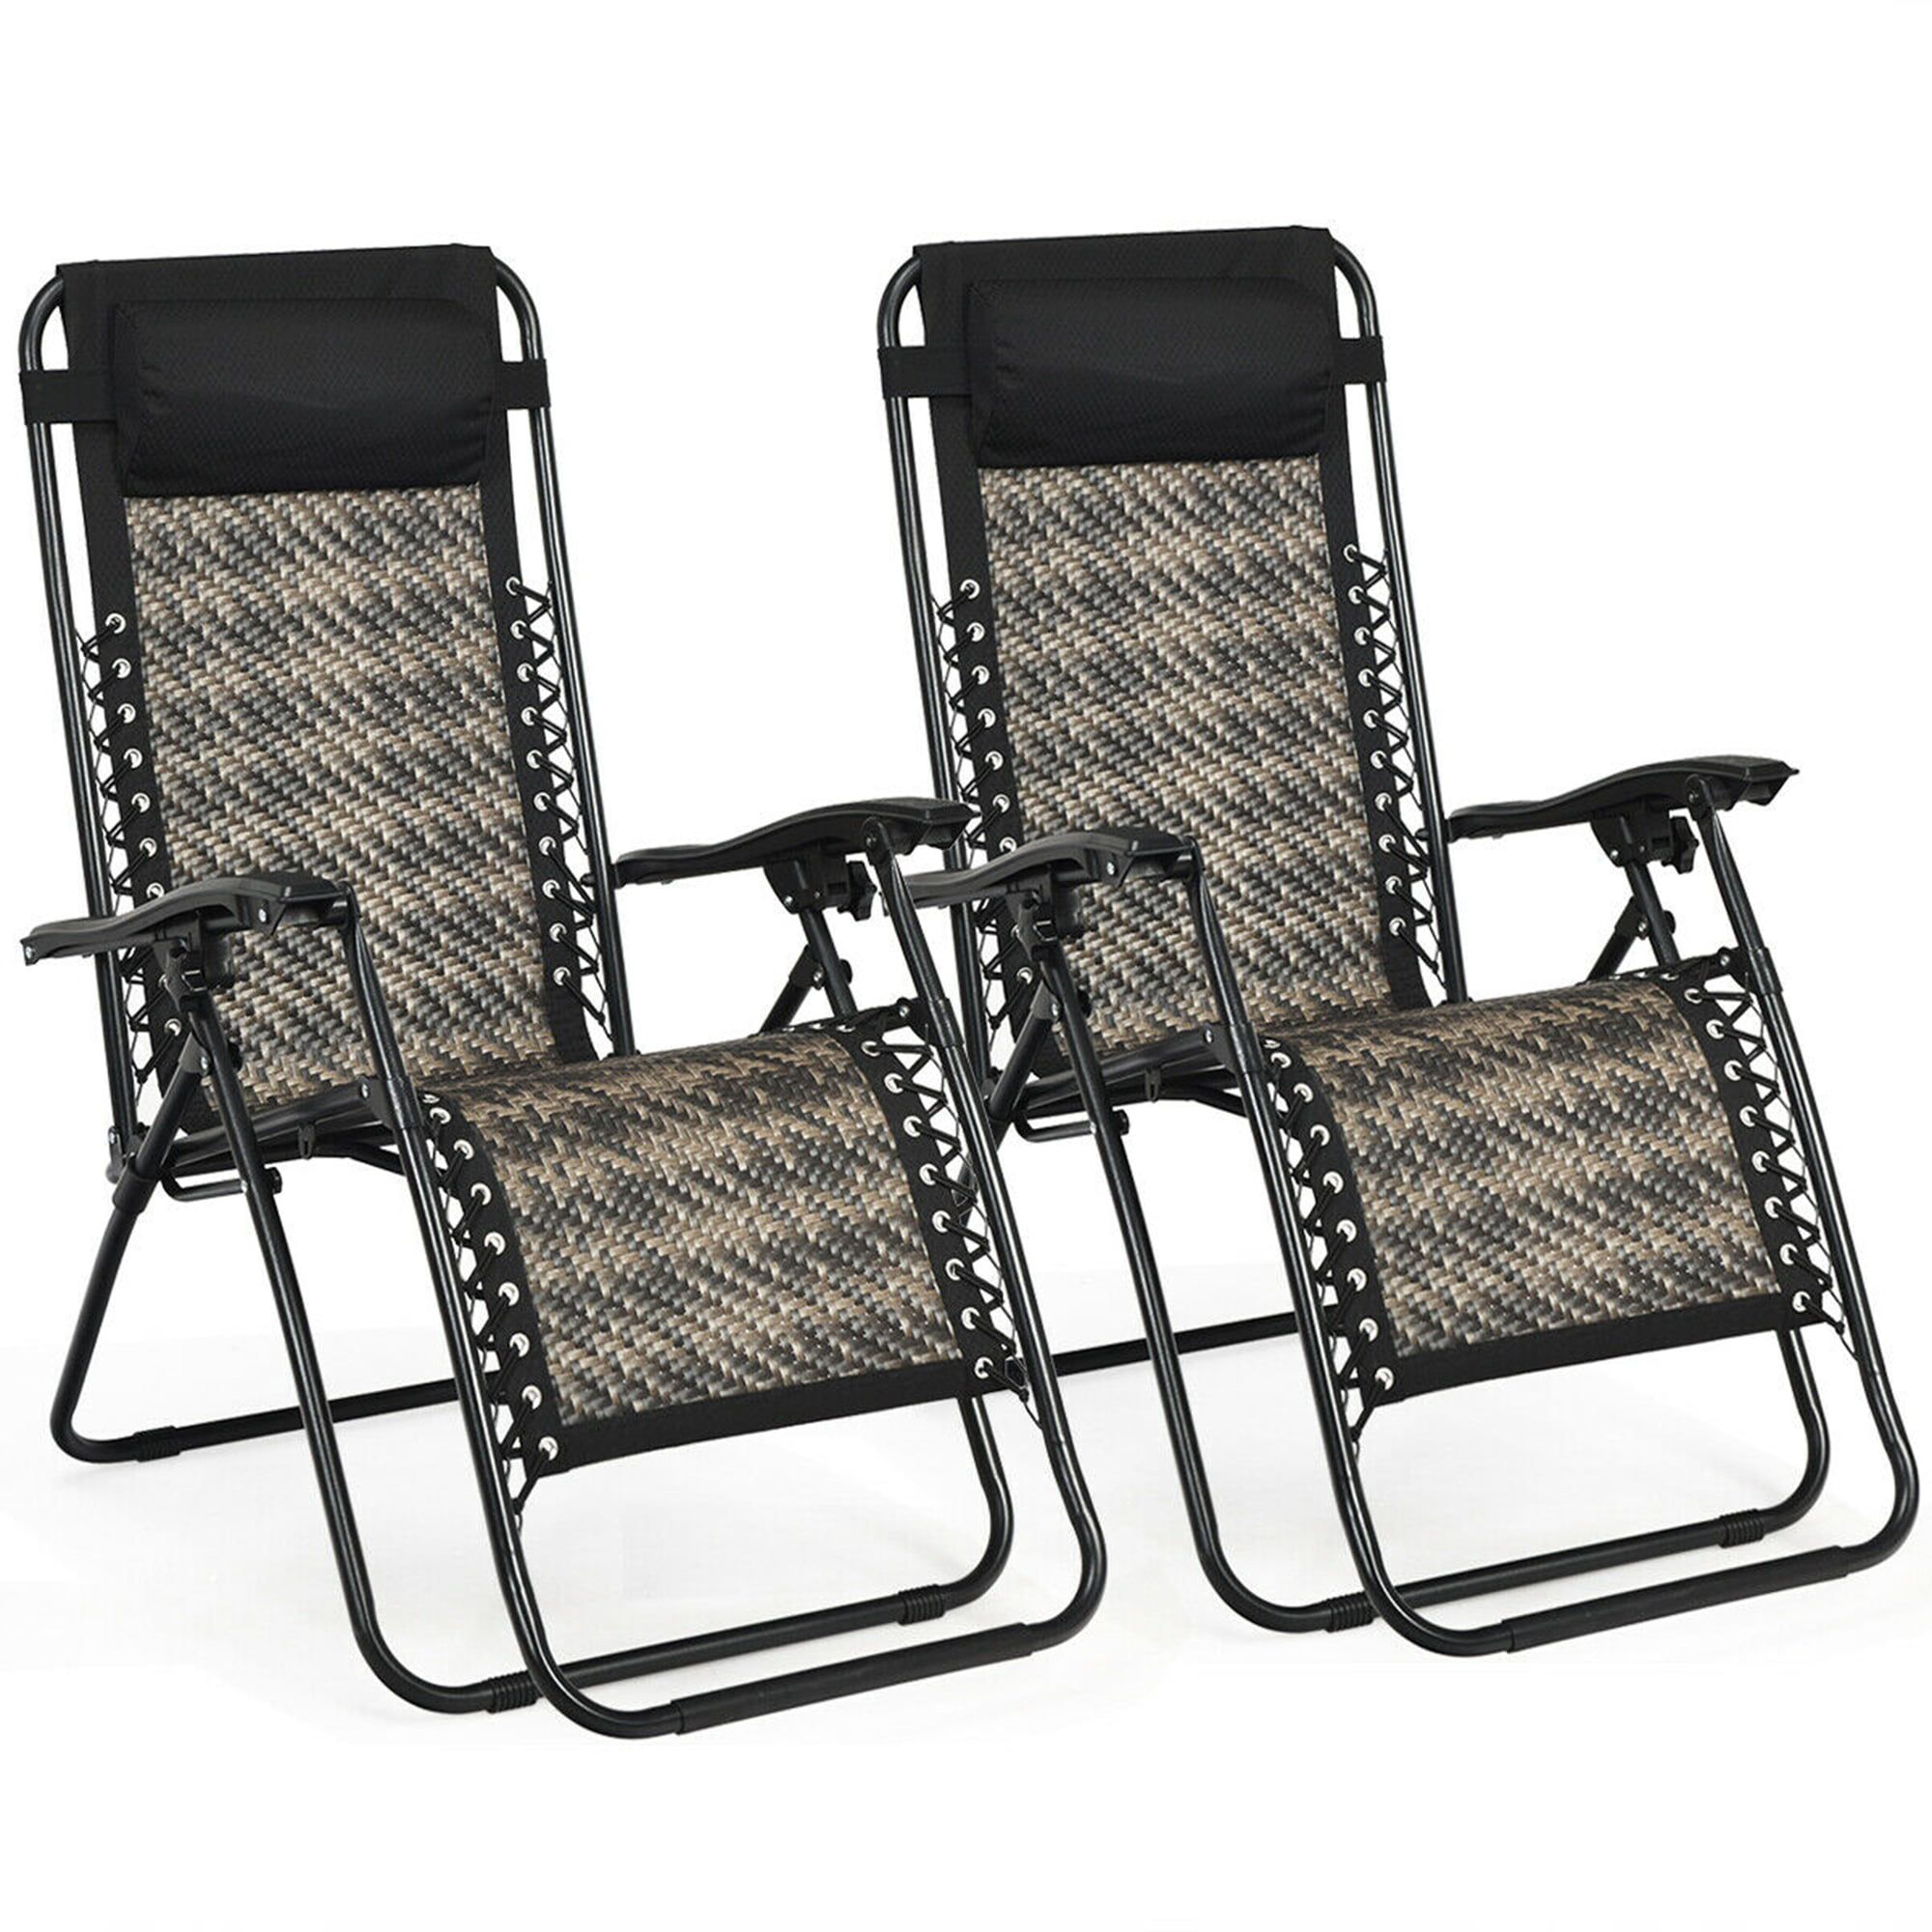 Gymax Set of 10 Folding Rattan Patio Zero Gravity Lounge Chair Recliner w/  Pillow   Walmart.com